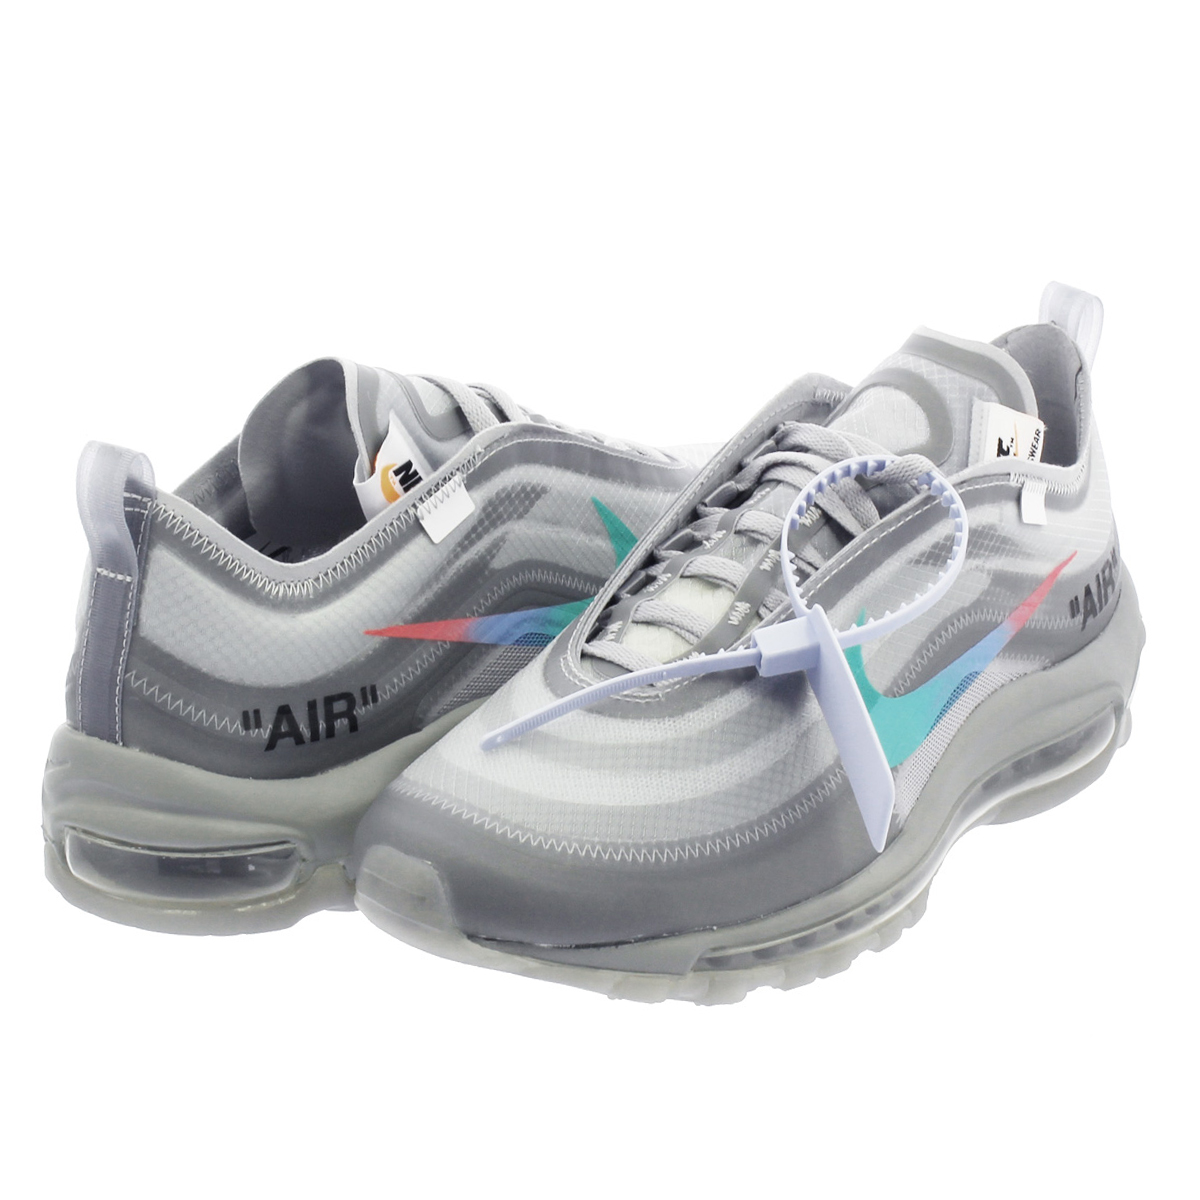 OFF WHITE (off white) X NIKE THE 10 AIR MAX 97 OG AJ4585 100 Kie Ney AMAX 97 sneakers white US8.5